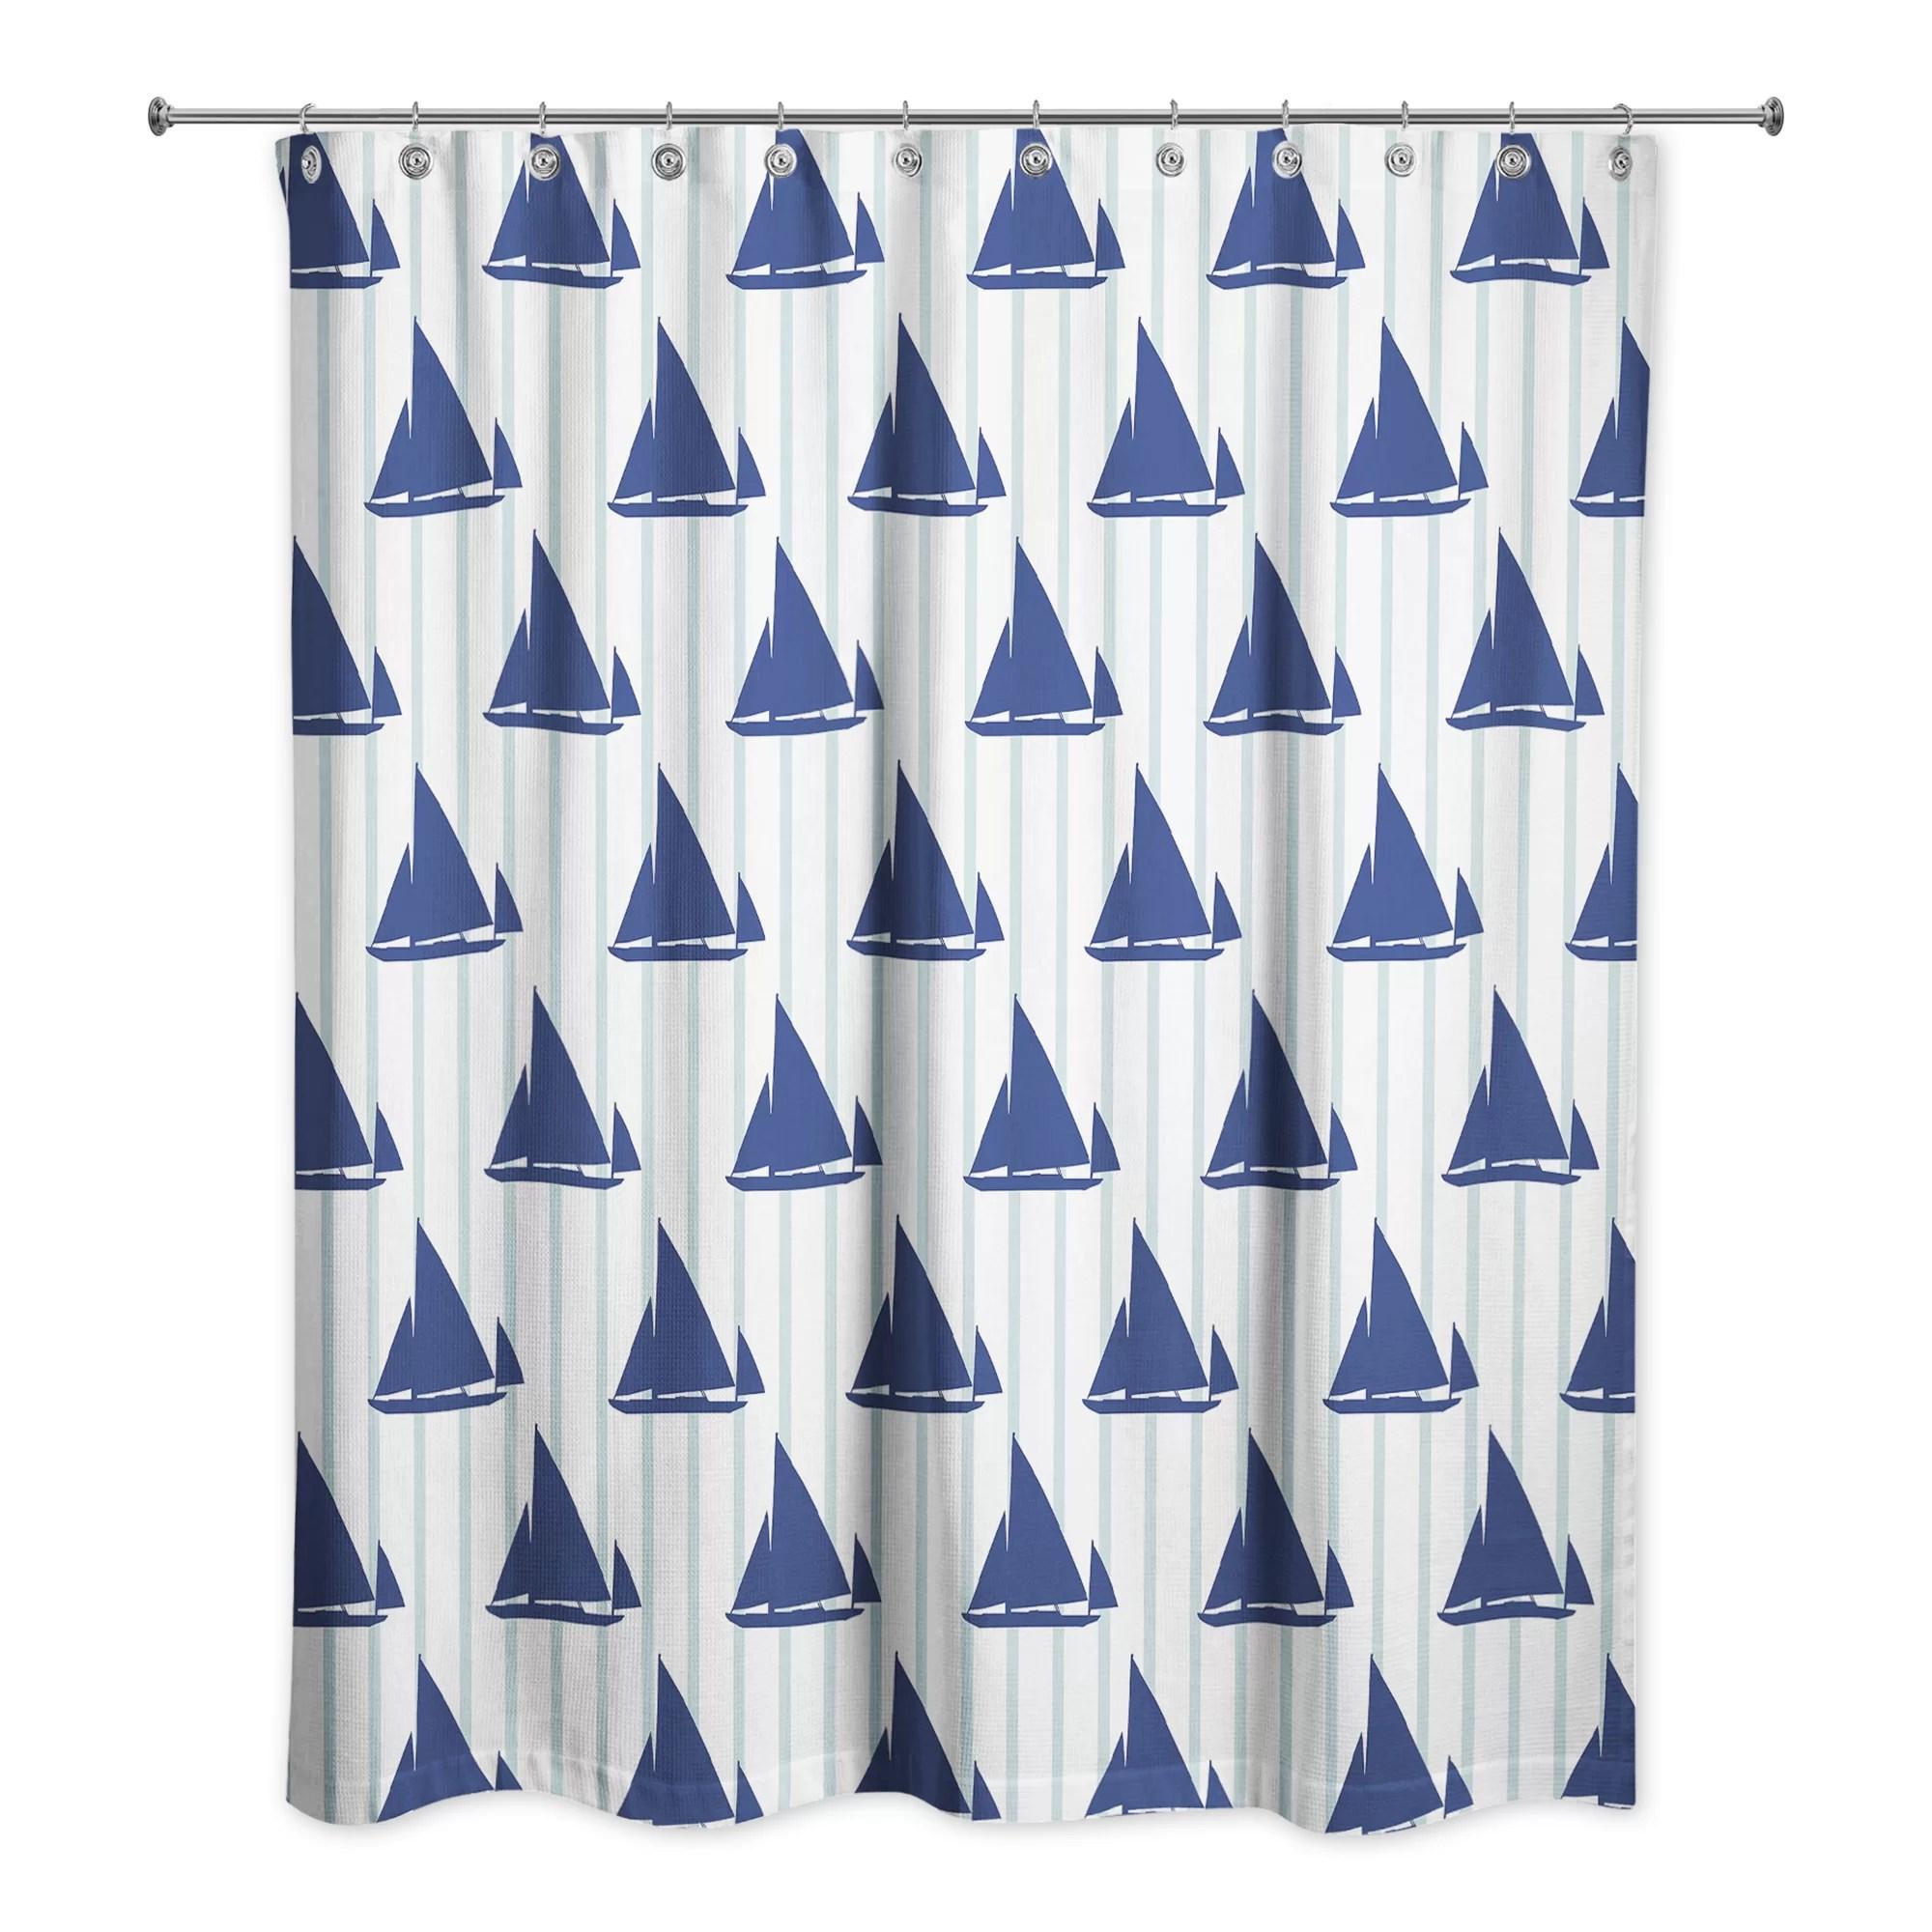 Joe Boat Stripes Single Shower Curtain